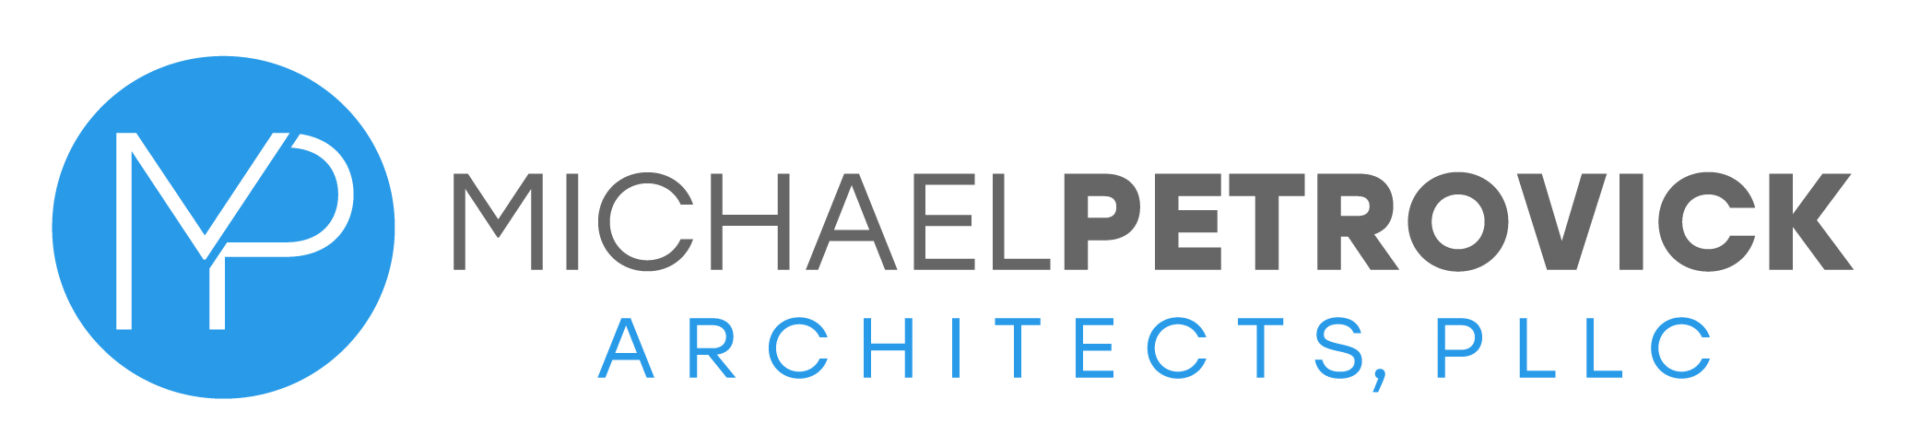 Michael Petrovick Architect